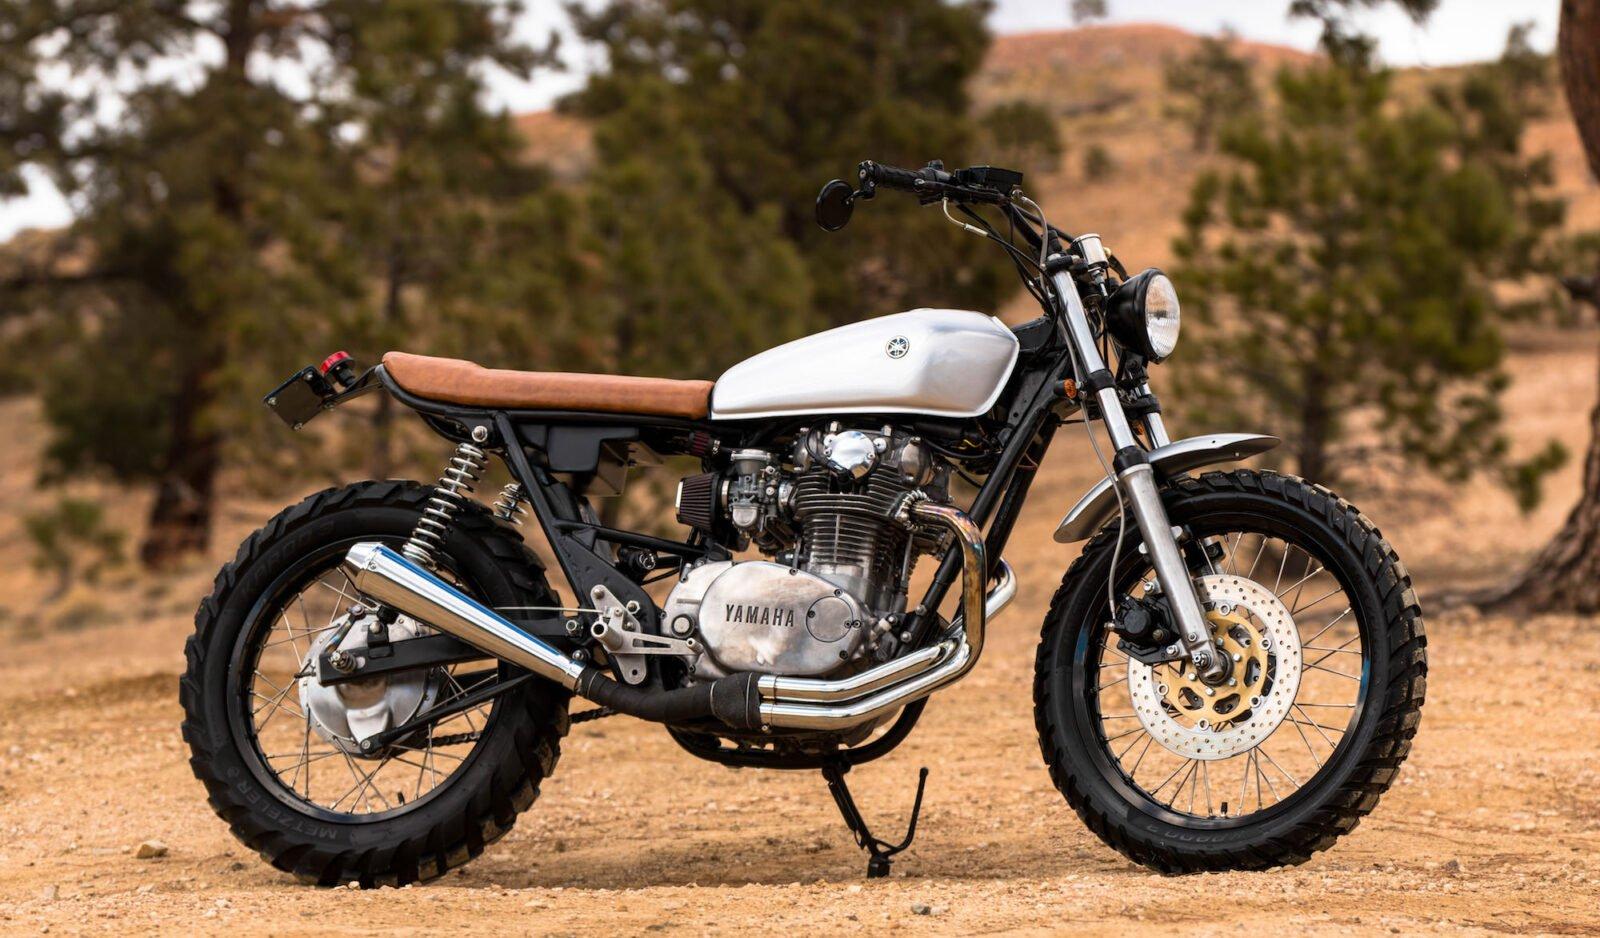 Custom Ducati Motorcycles For Sale